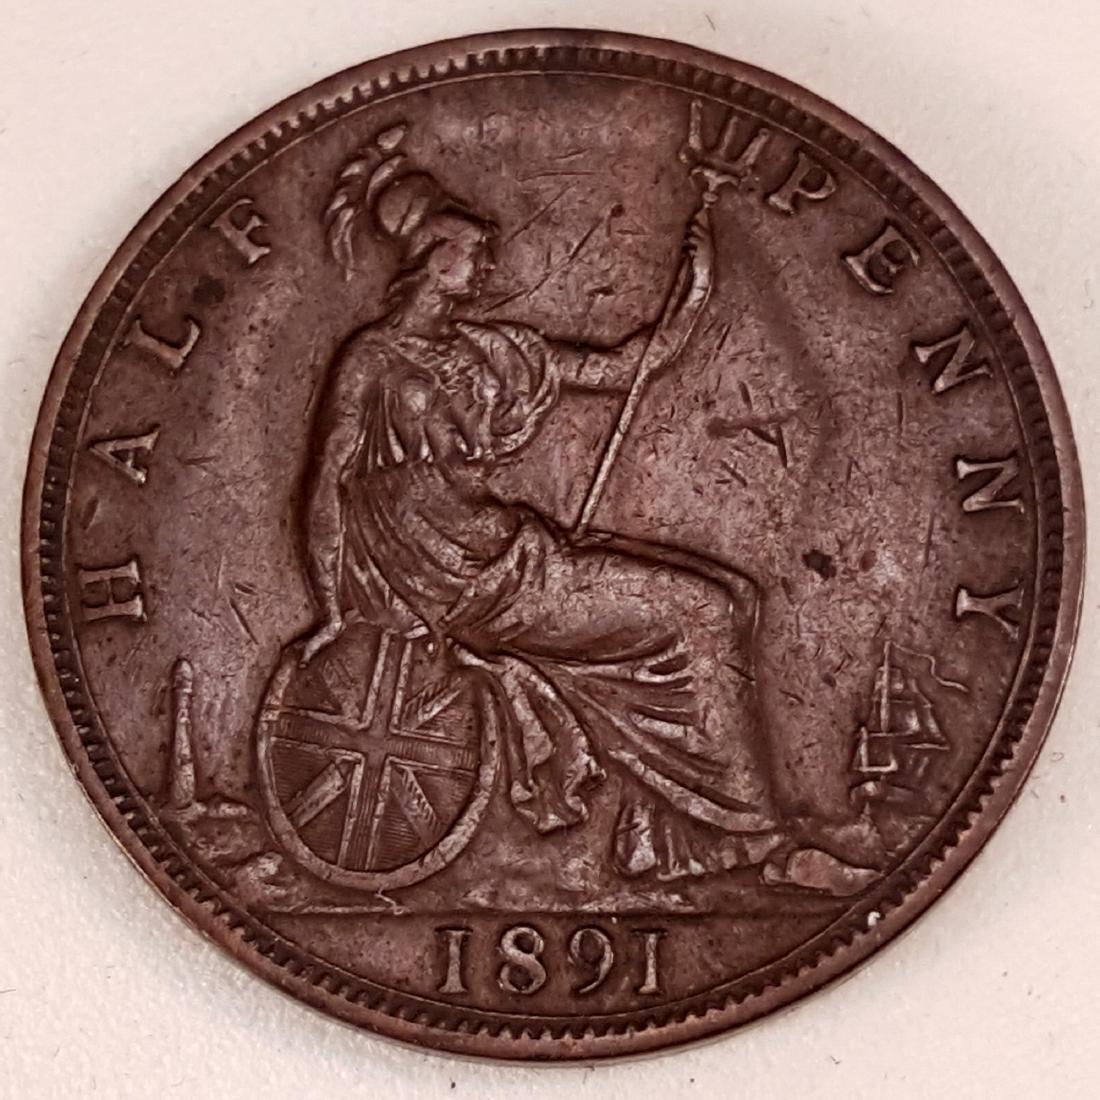 1891 GR.BRITAIN HALF PENNY VF-XF